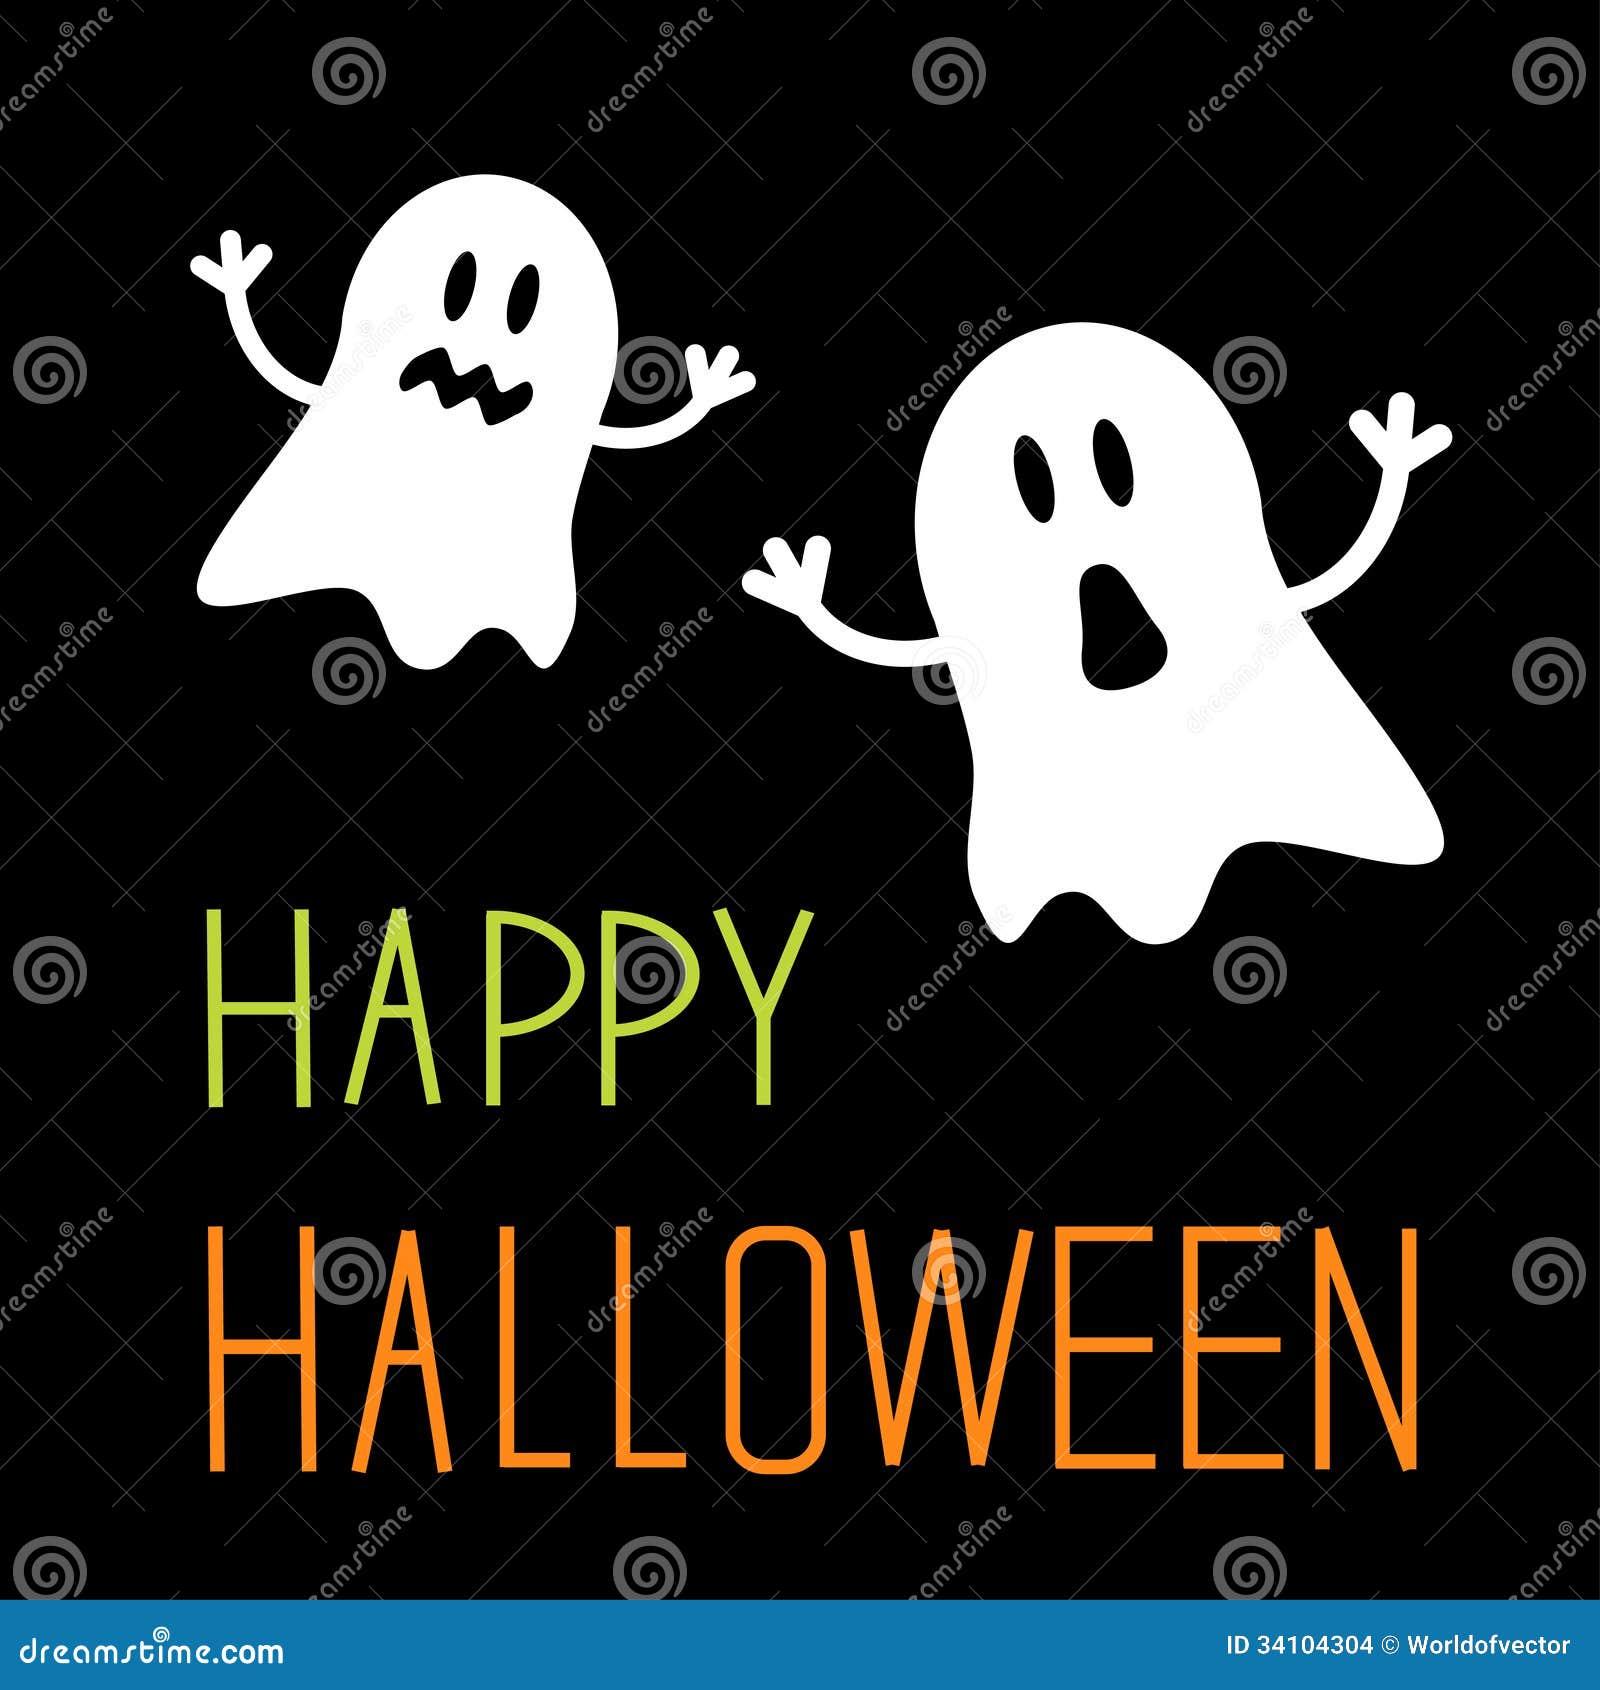 dos fantasmas divertidos de halloween tarjeta imagenes de archivo imagen 34104304. Black Bedroom Furniture Sets. Home Design Ideas